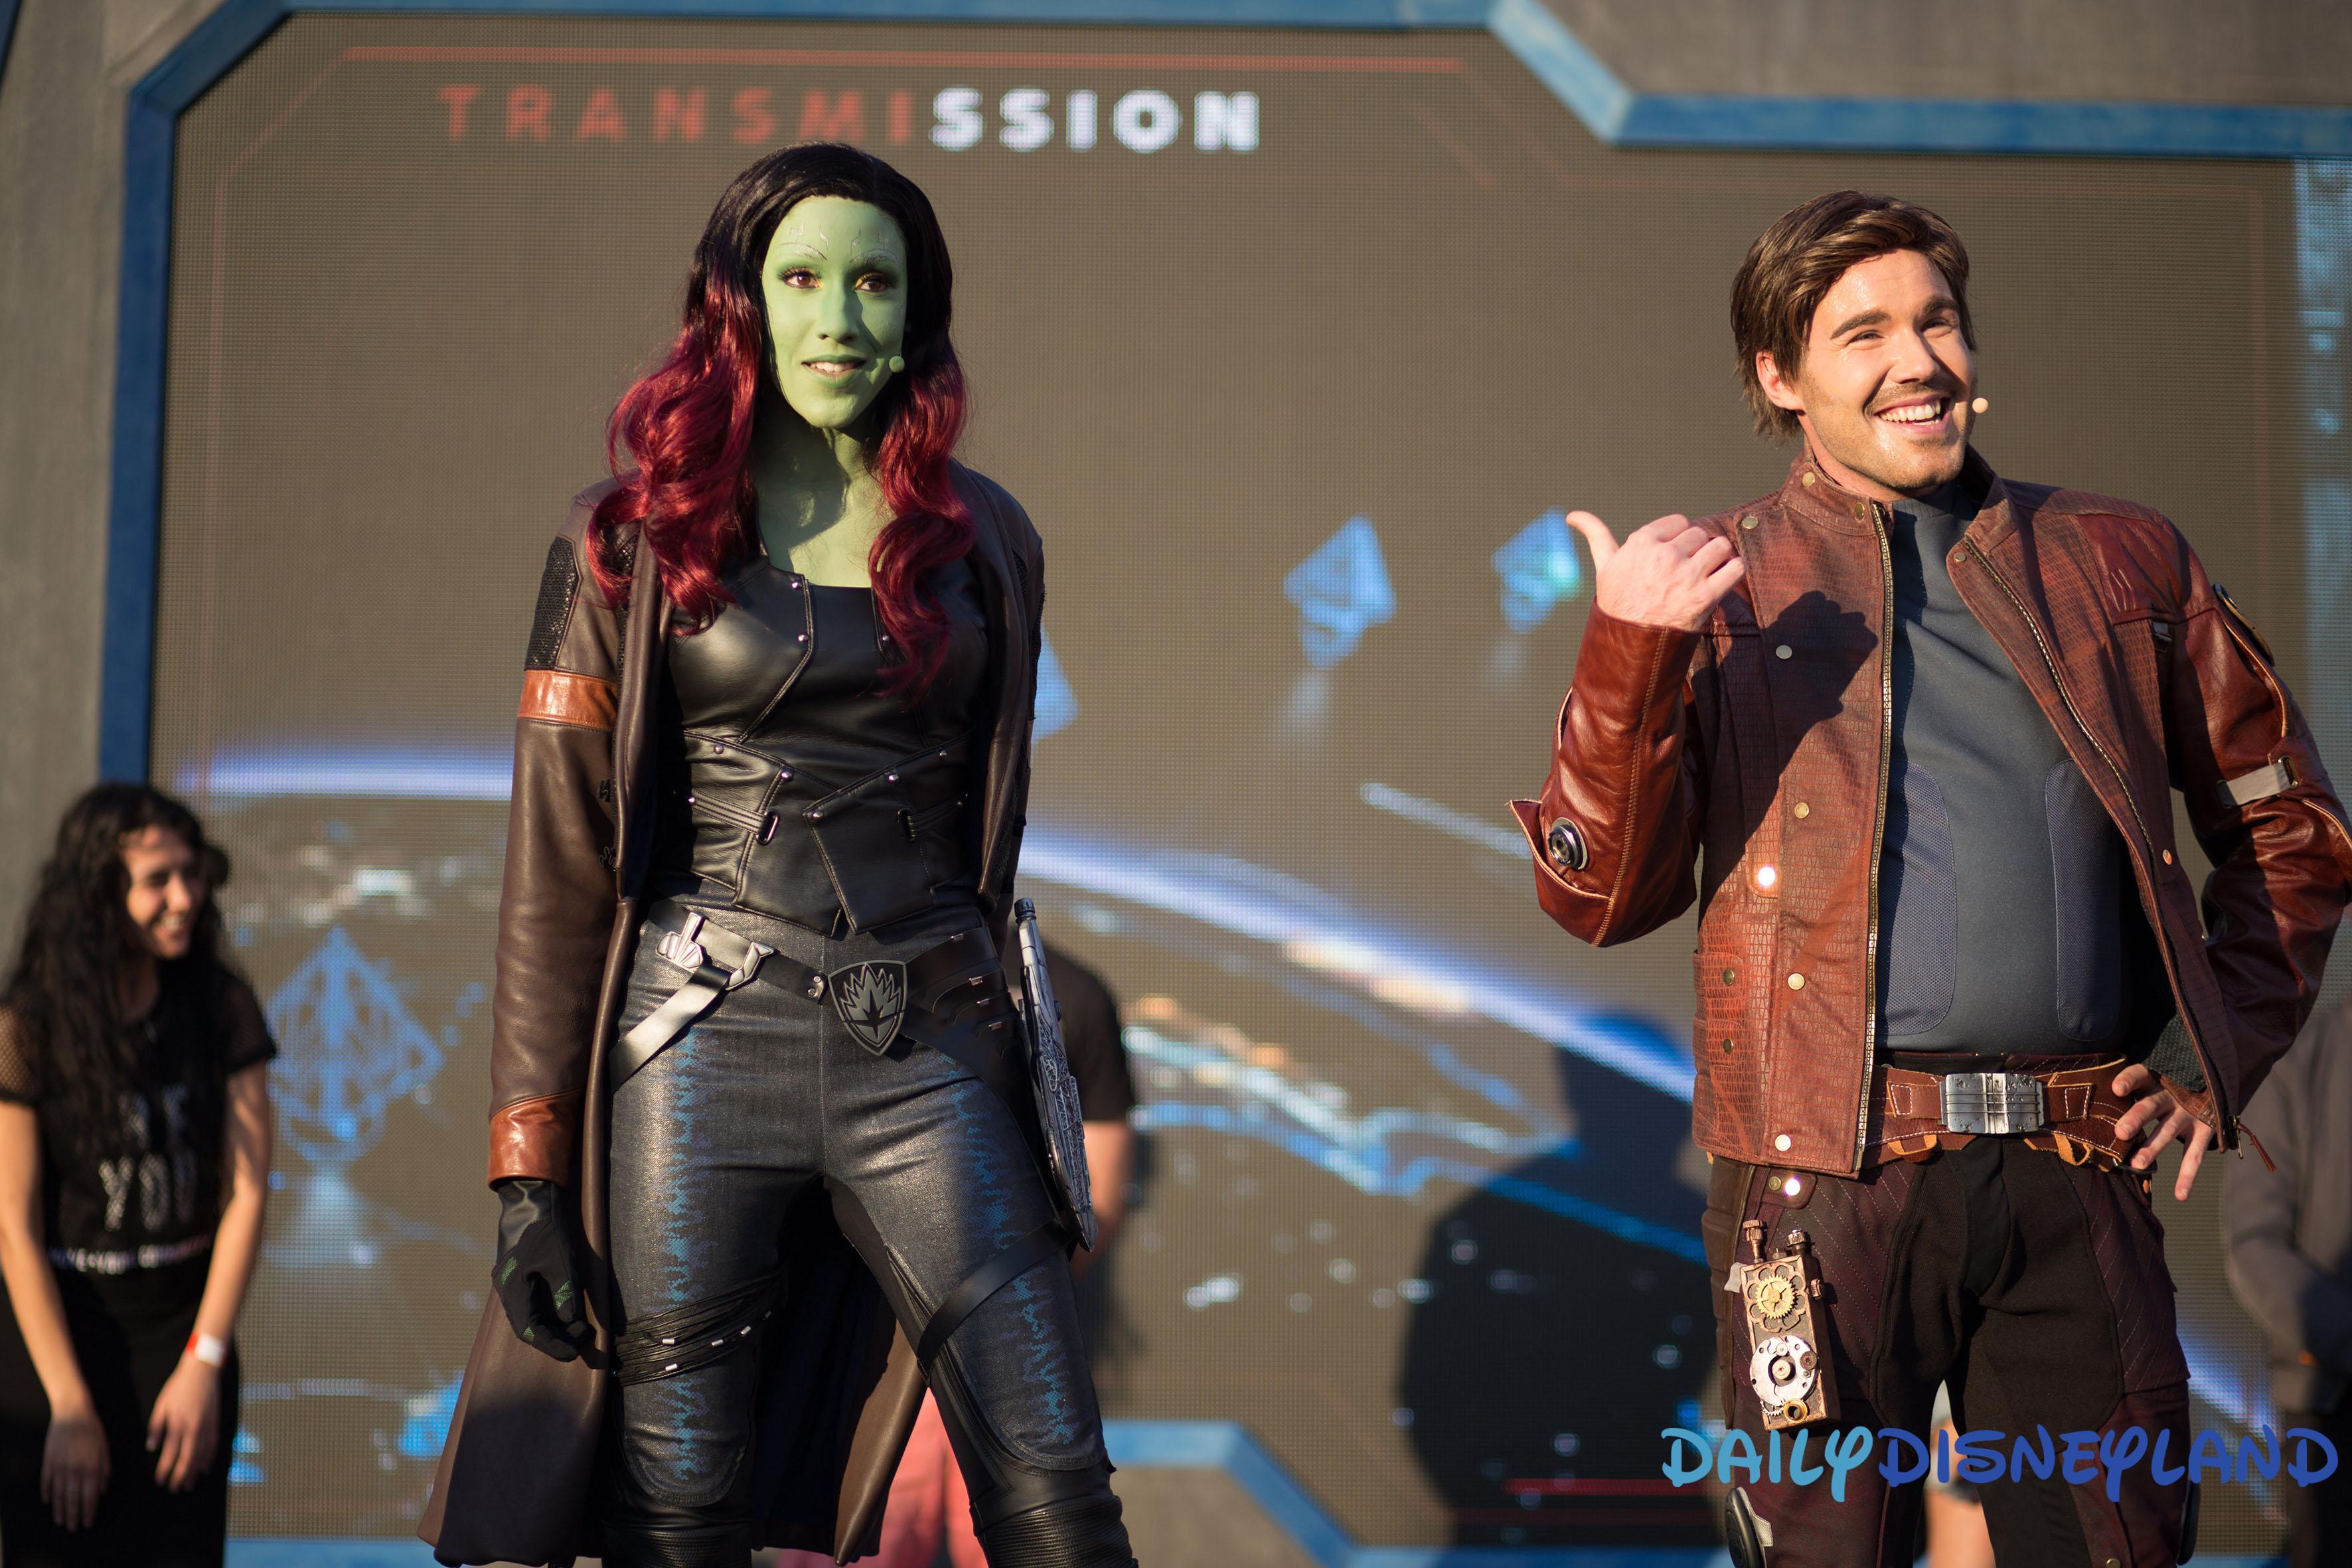 marvel summer of super heroes united danse avec les gardiens de la galaxie ete super heros marvel